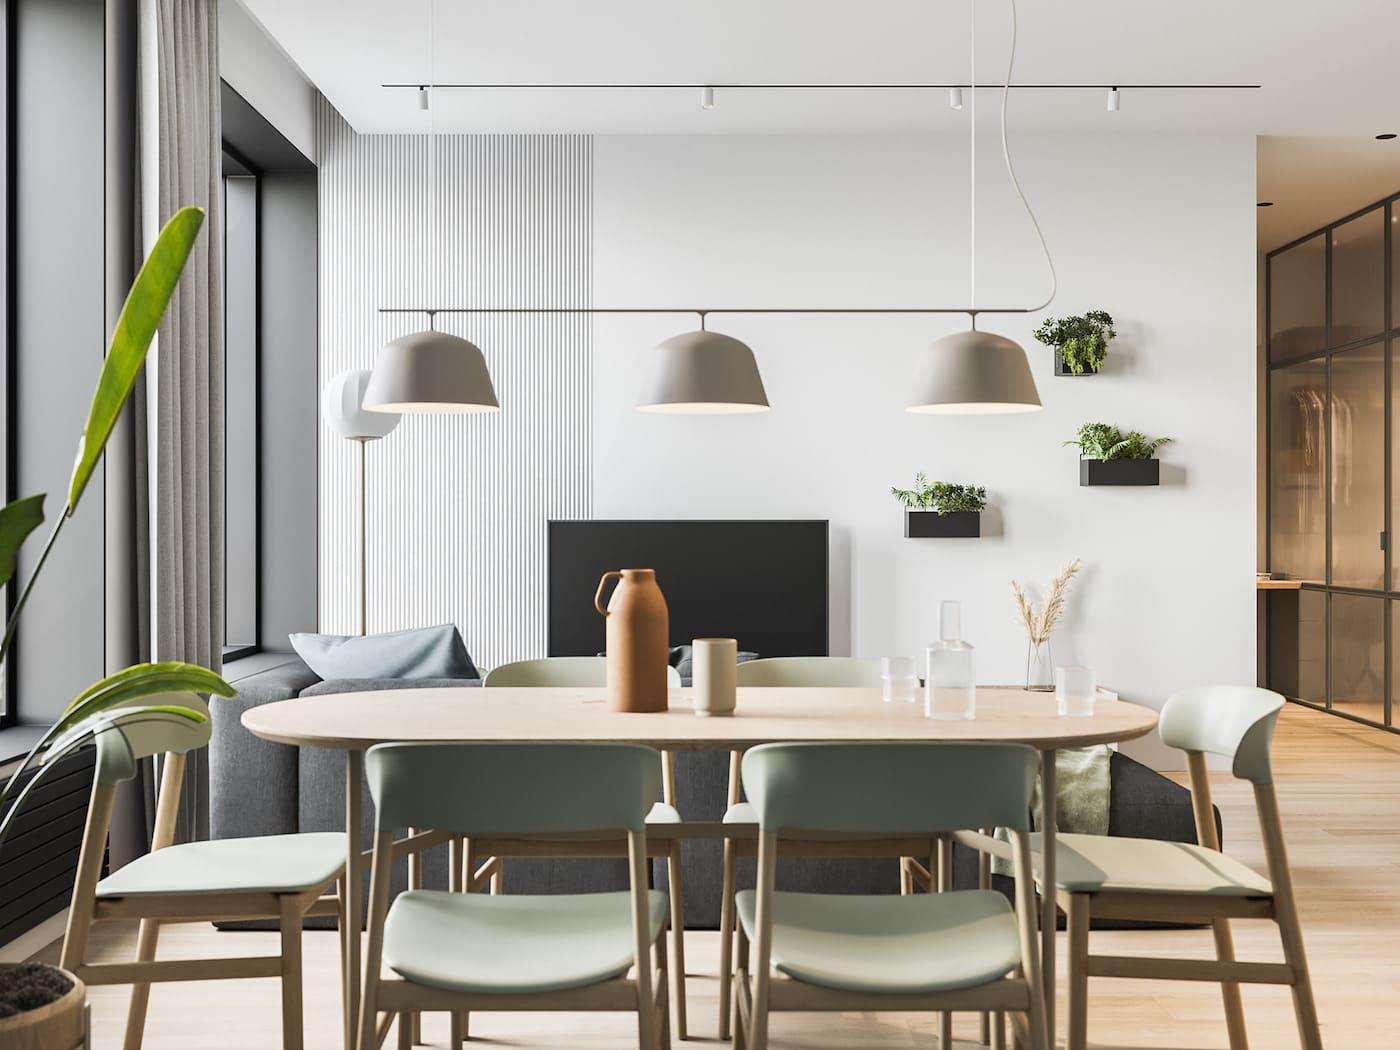 дизайн интерьера модной квартиры фото 47